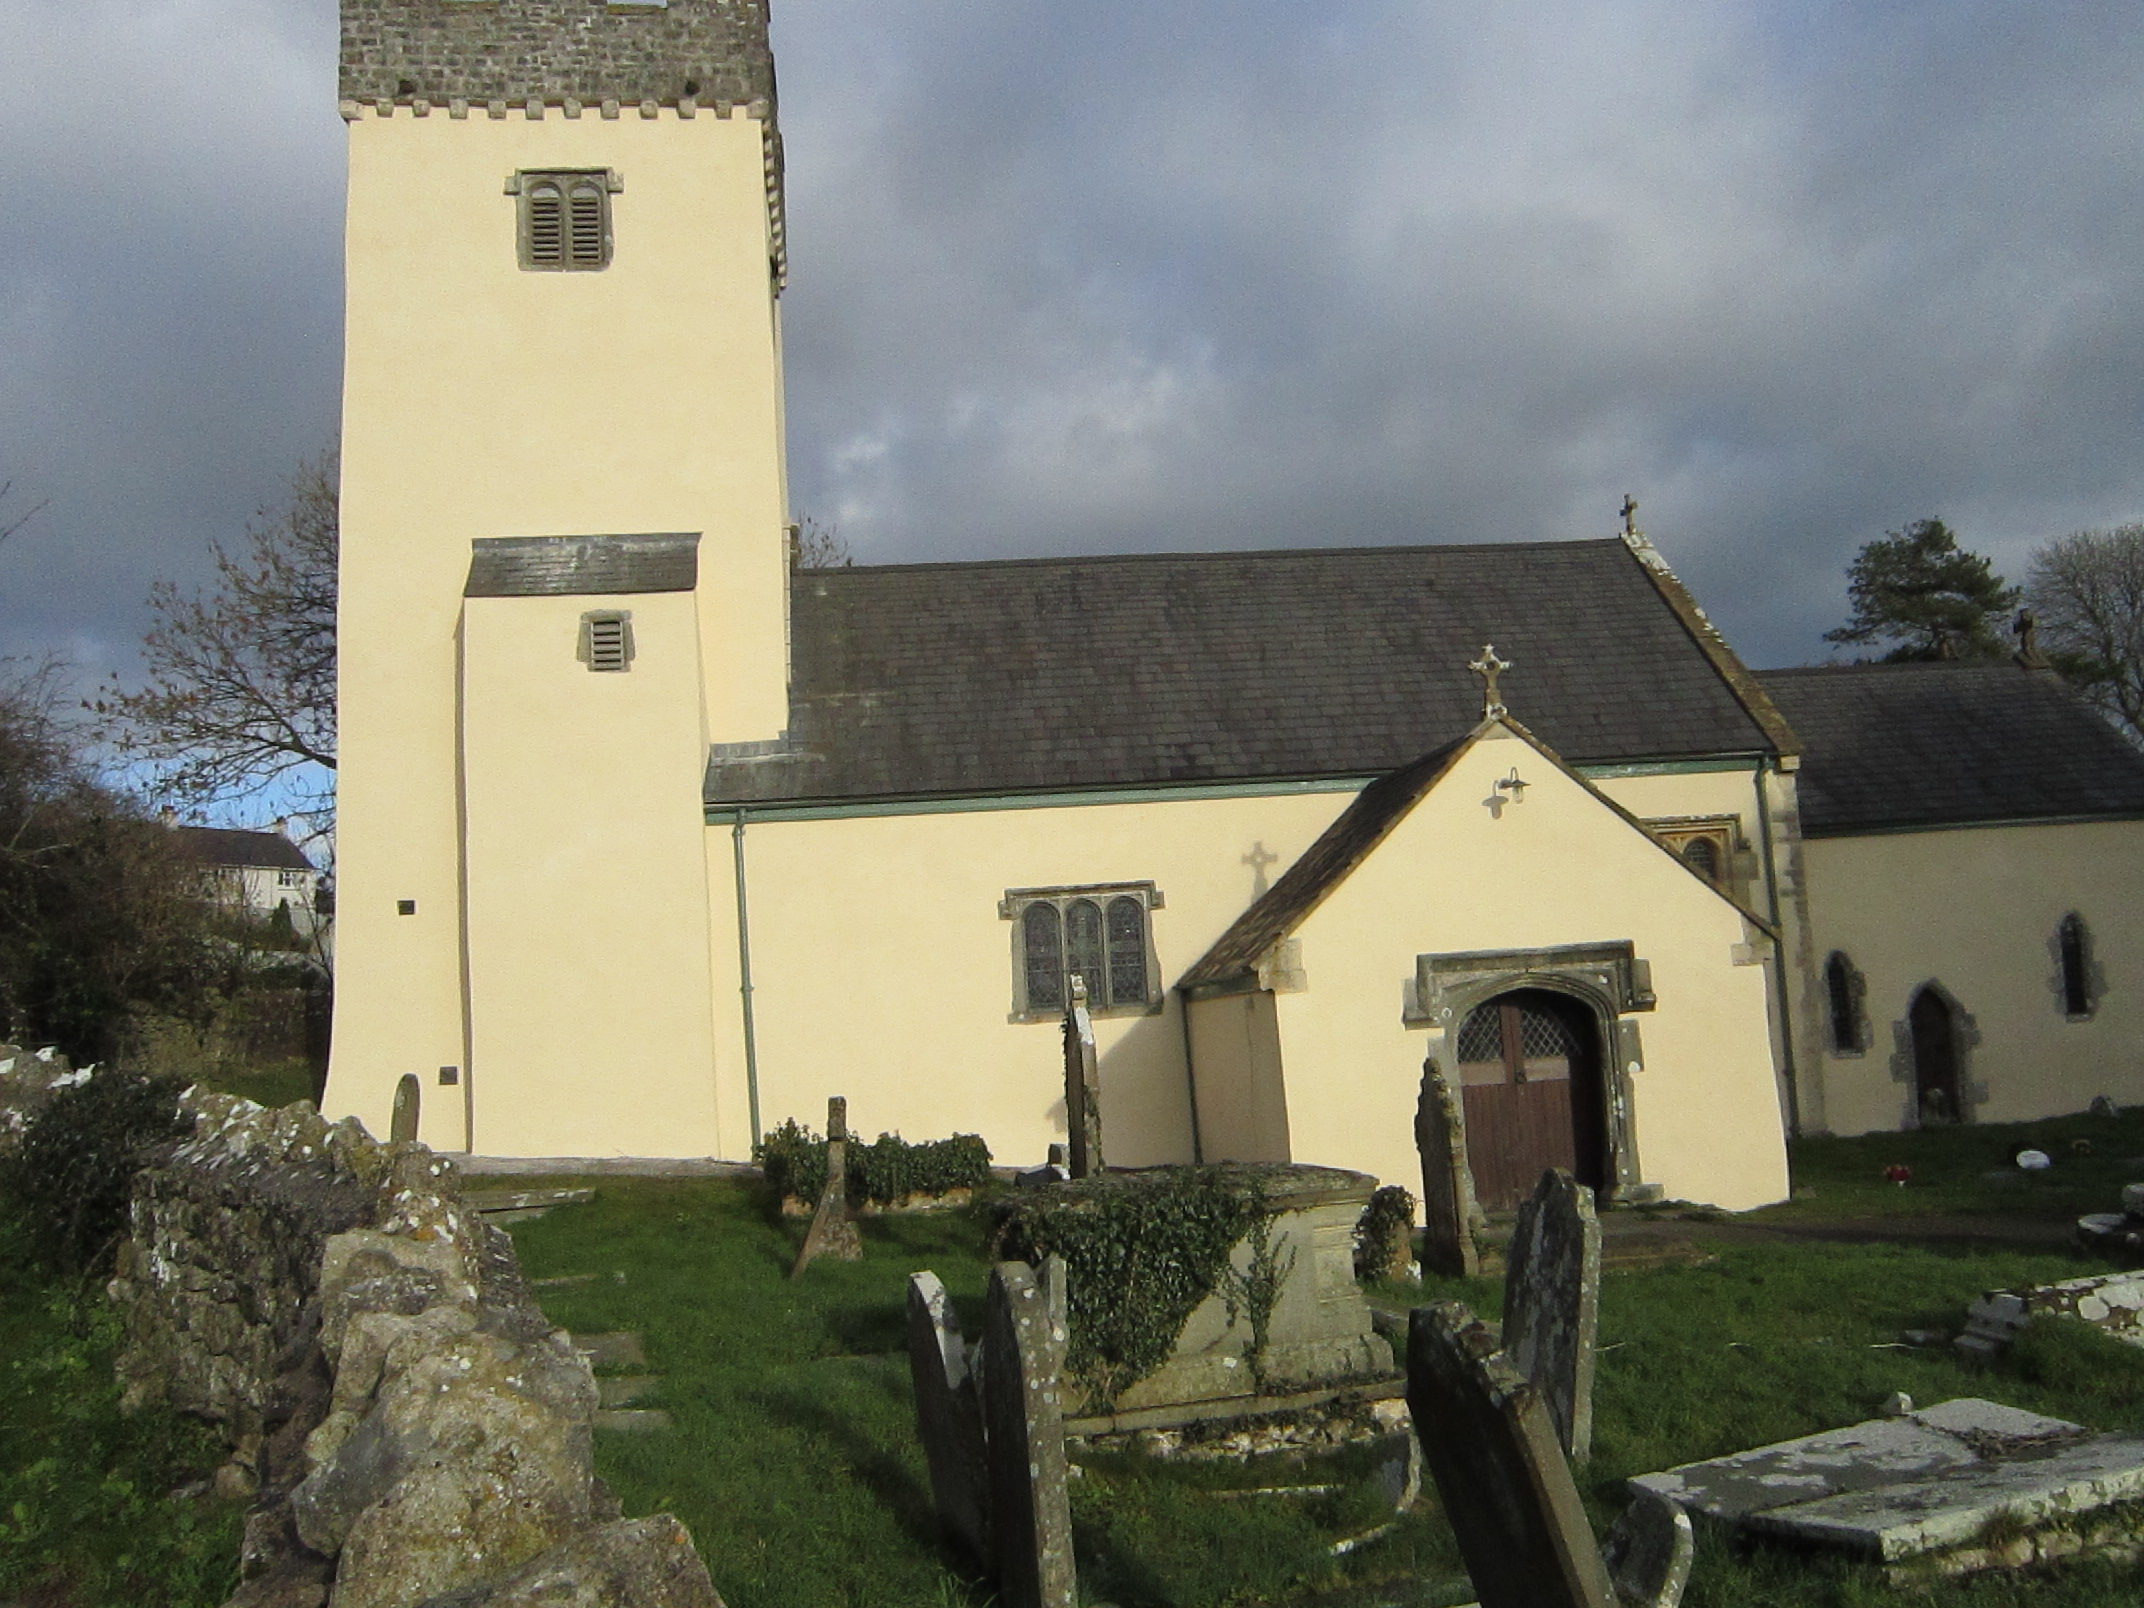 St. Michael's Renovation 2012